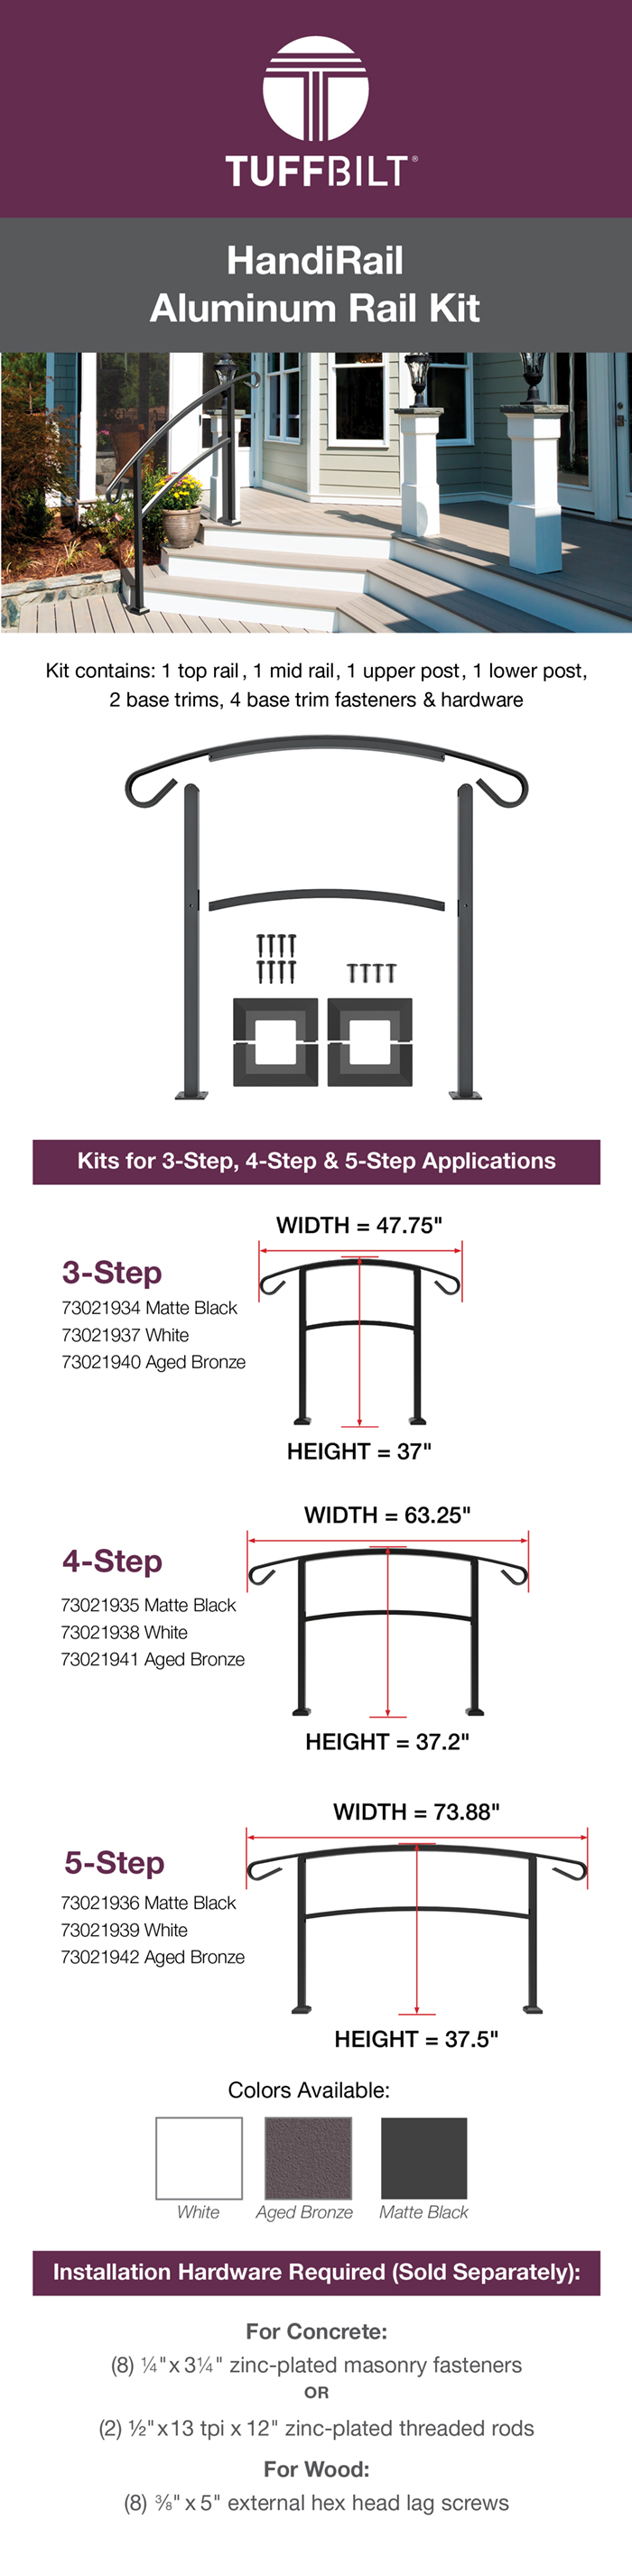 tuffbilt-handirail-infographic.jpg